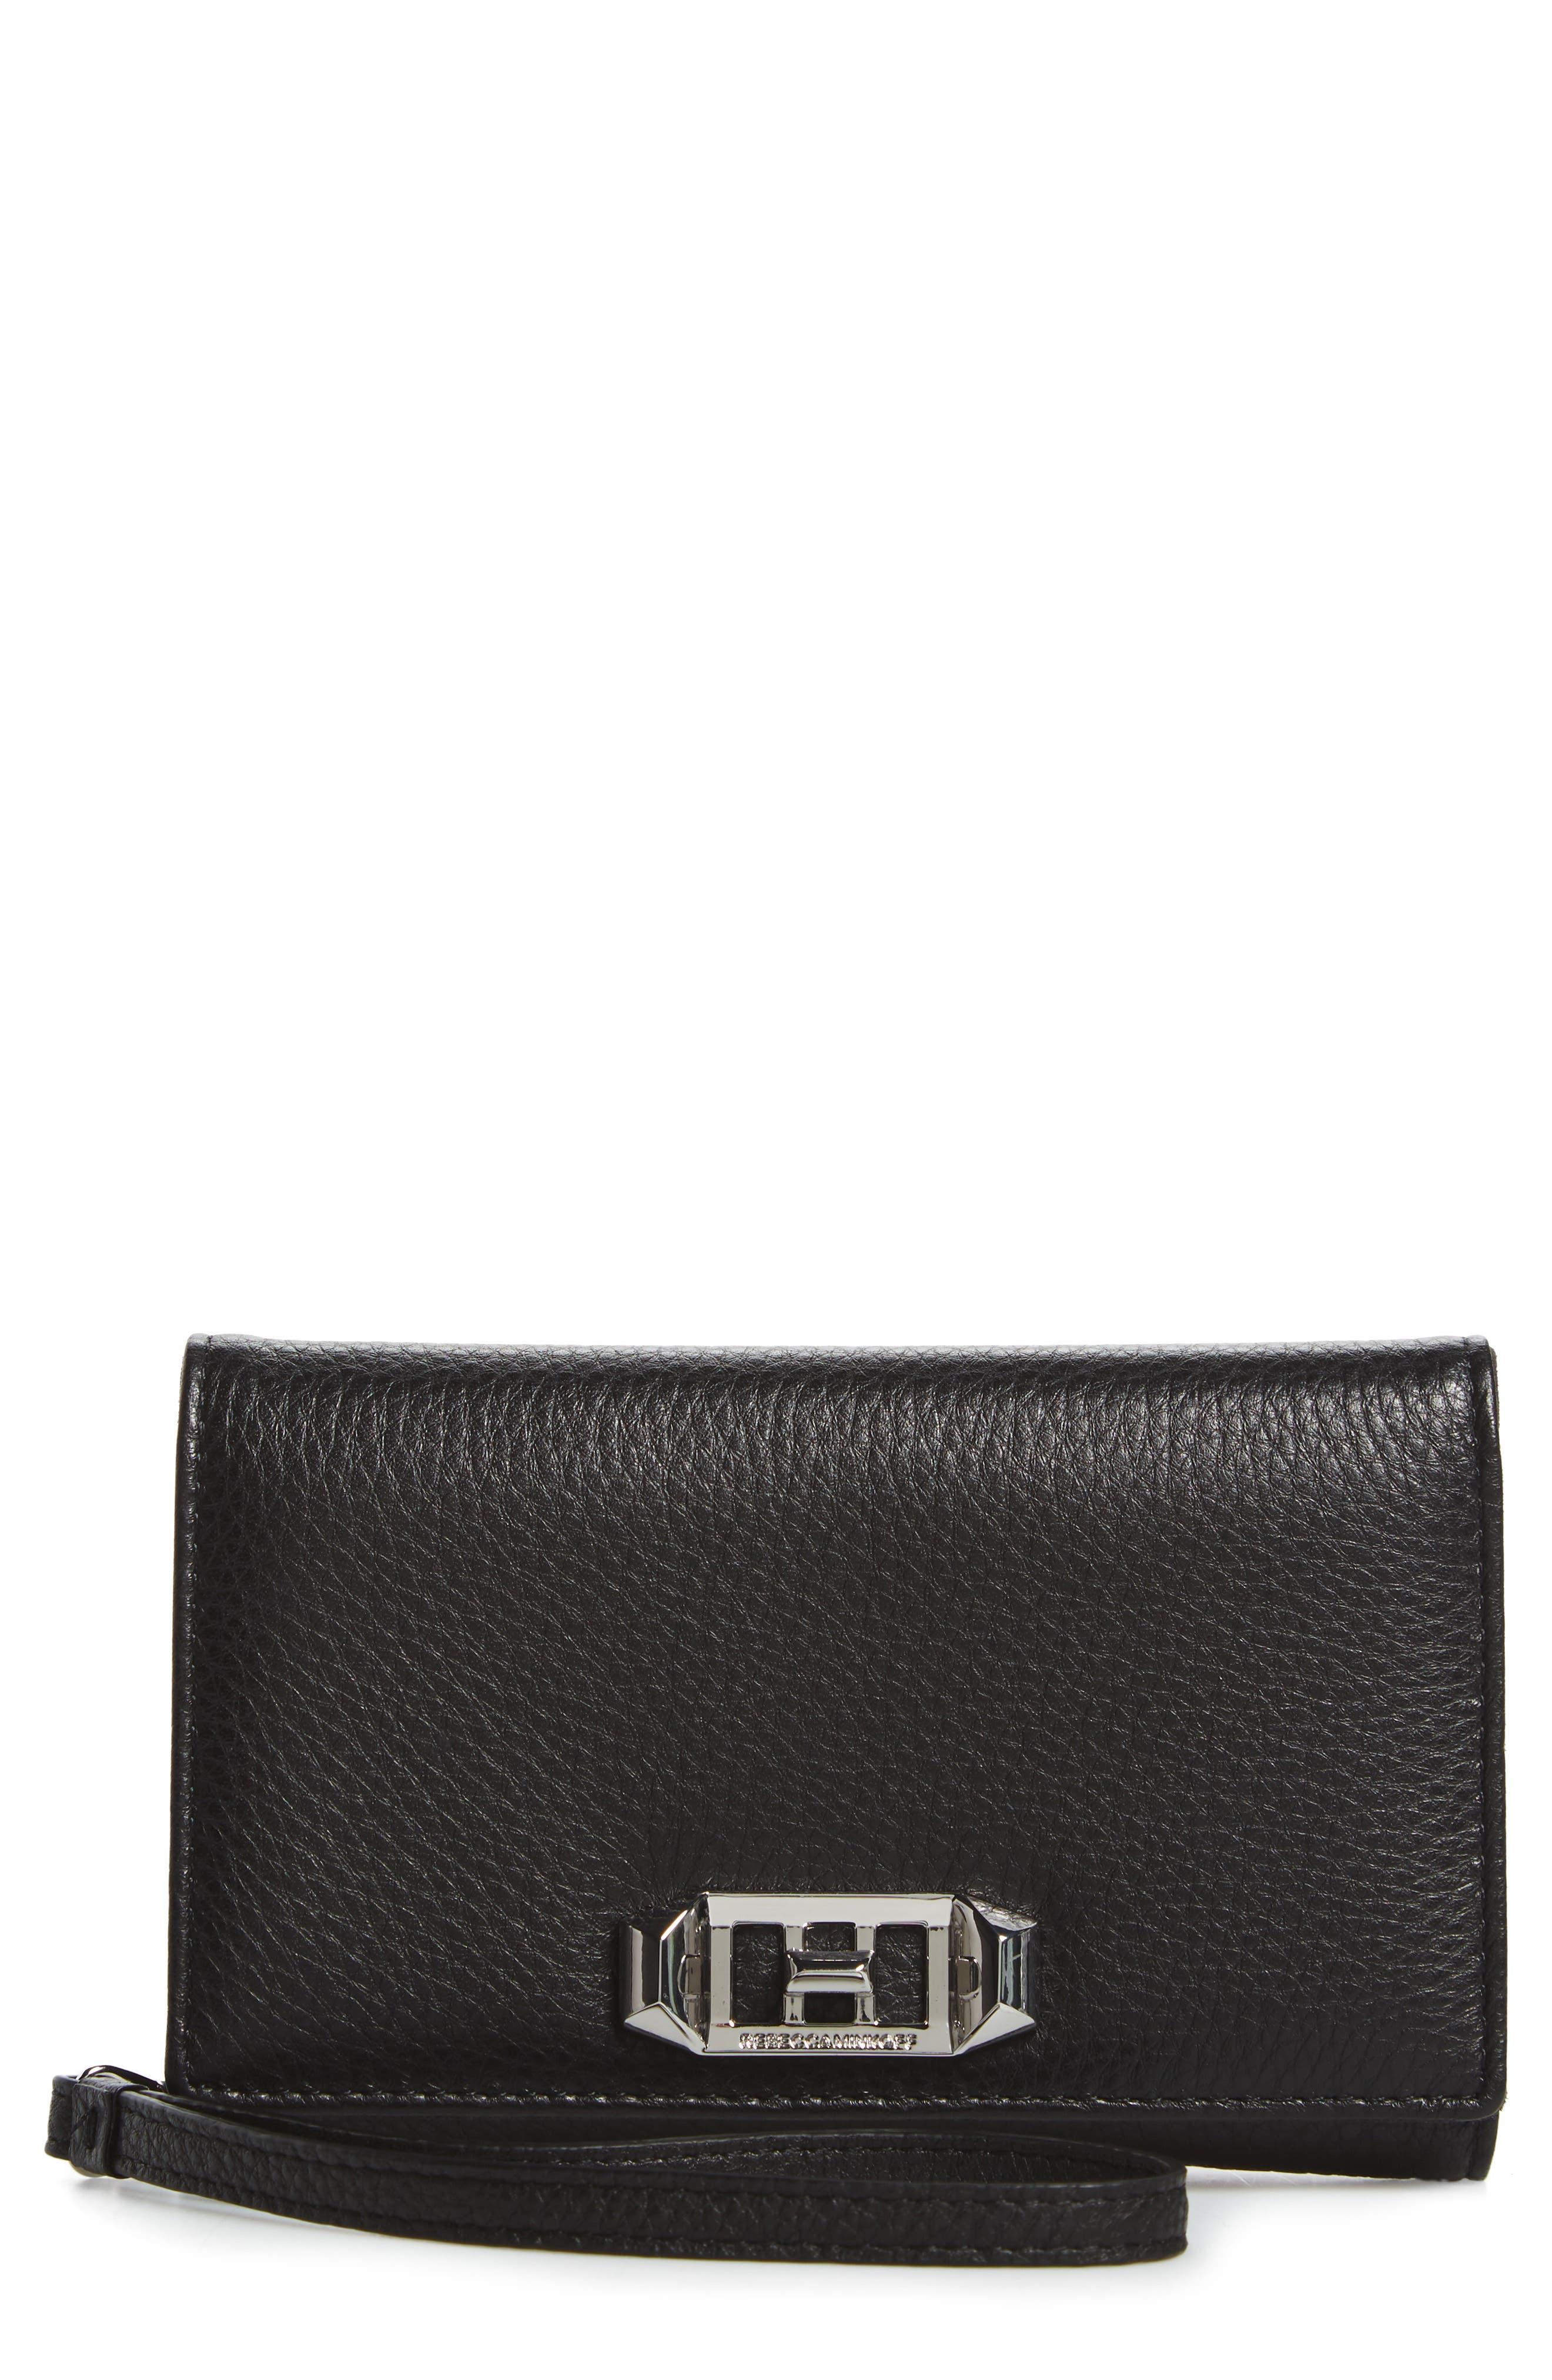 REBECCA MINKOFF Love Lock iPhone X/Xs Leather Wristlet Folio, Main, color, 001